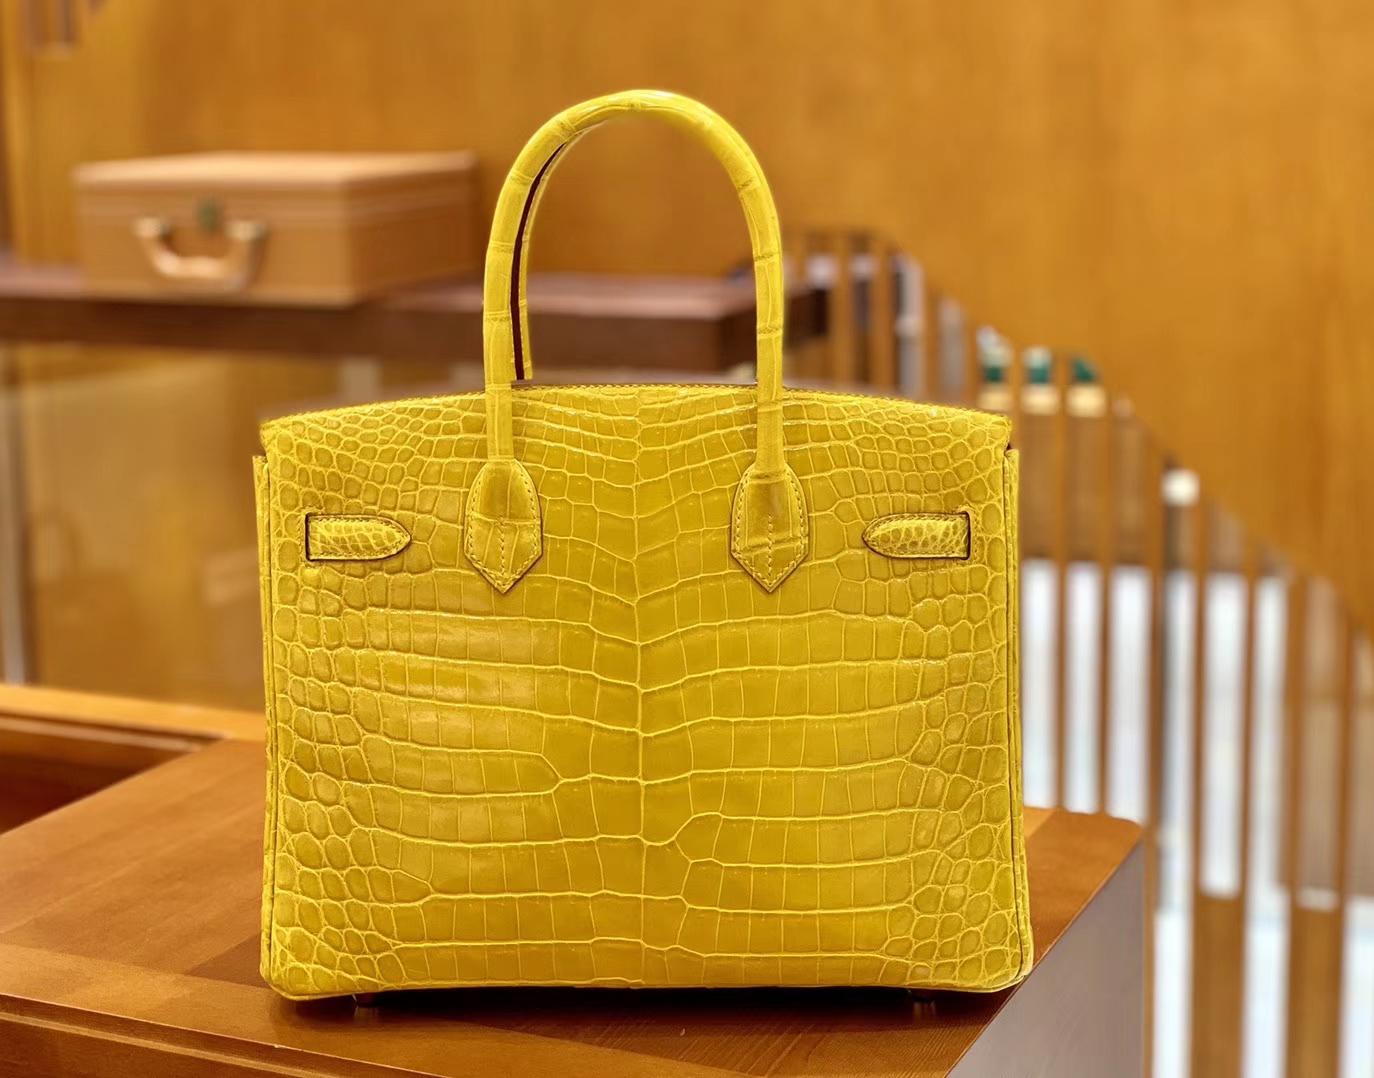 Hermès(爱马仕)Birkin 铂金包 琥珀黄 一级皮 尼罗鳄鱼皮 臻品级别 金扣 30cm